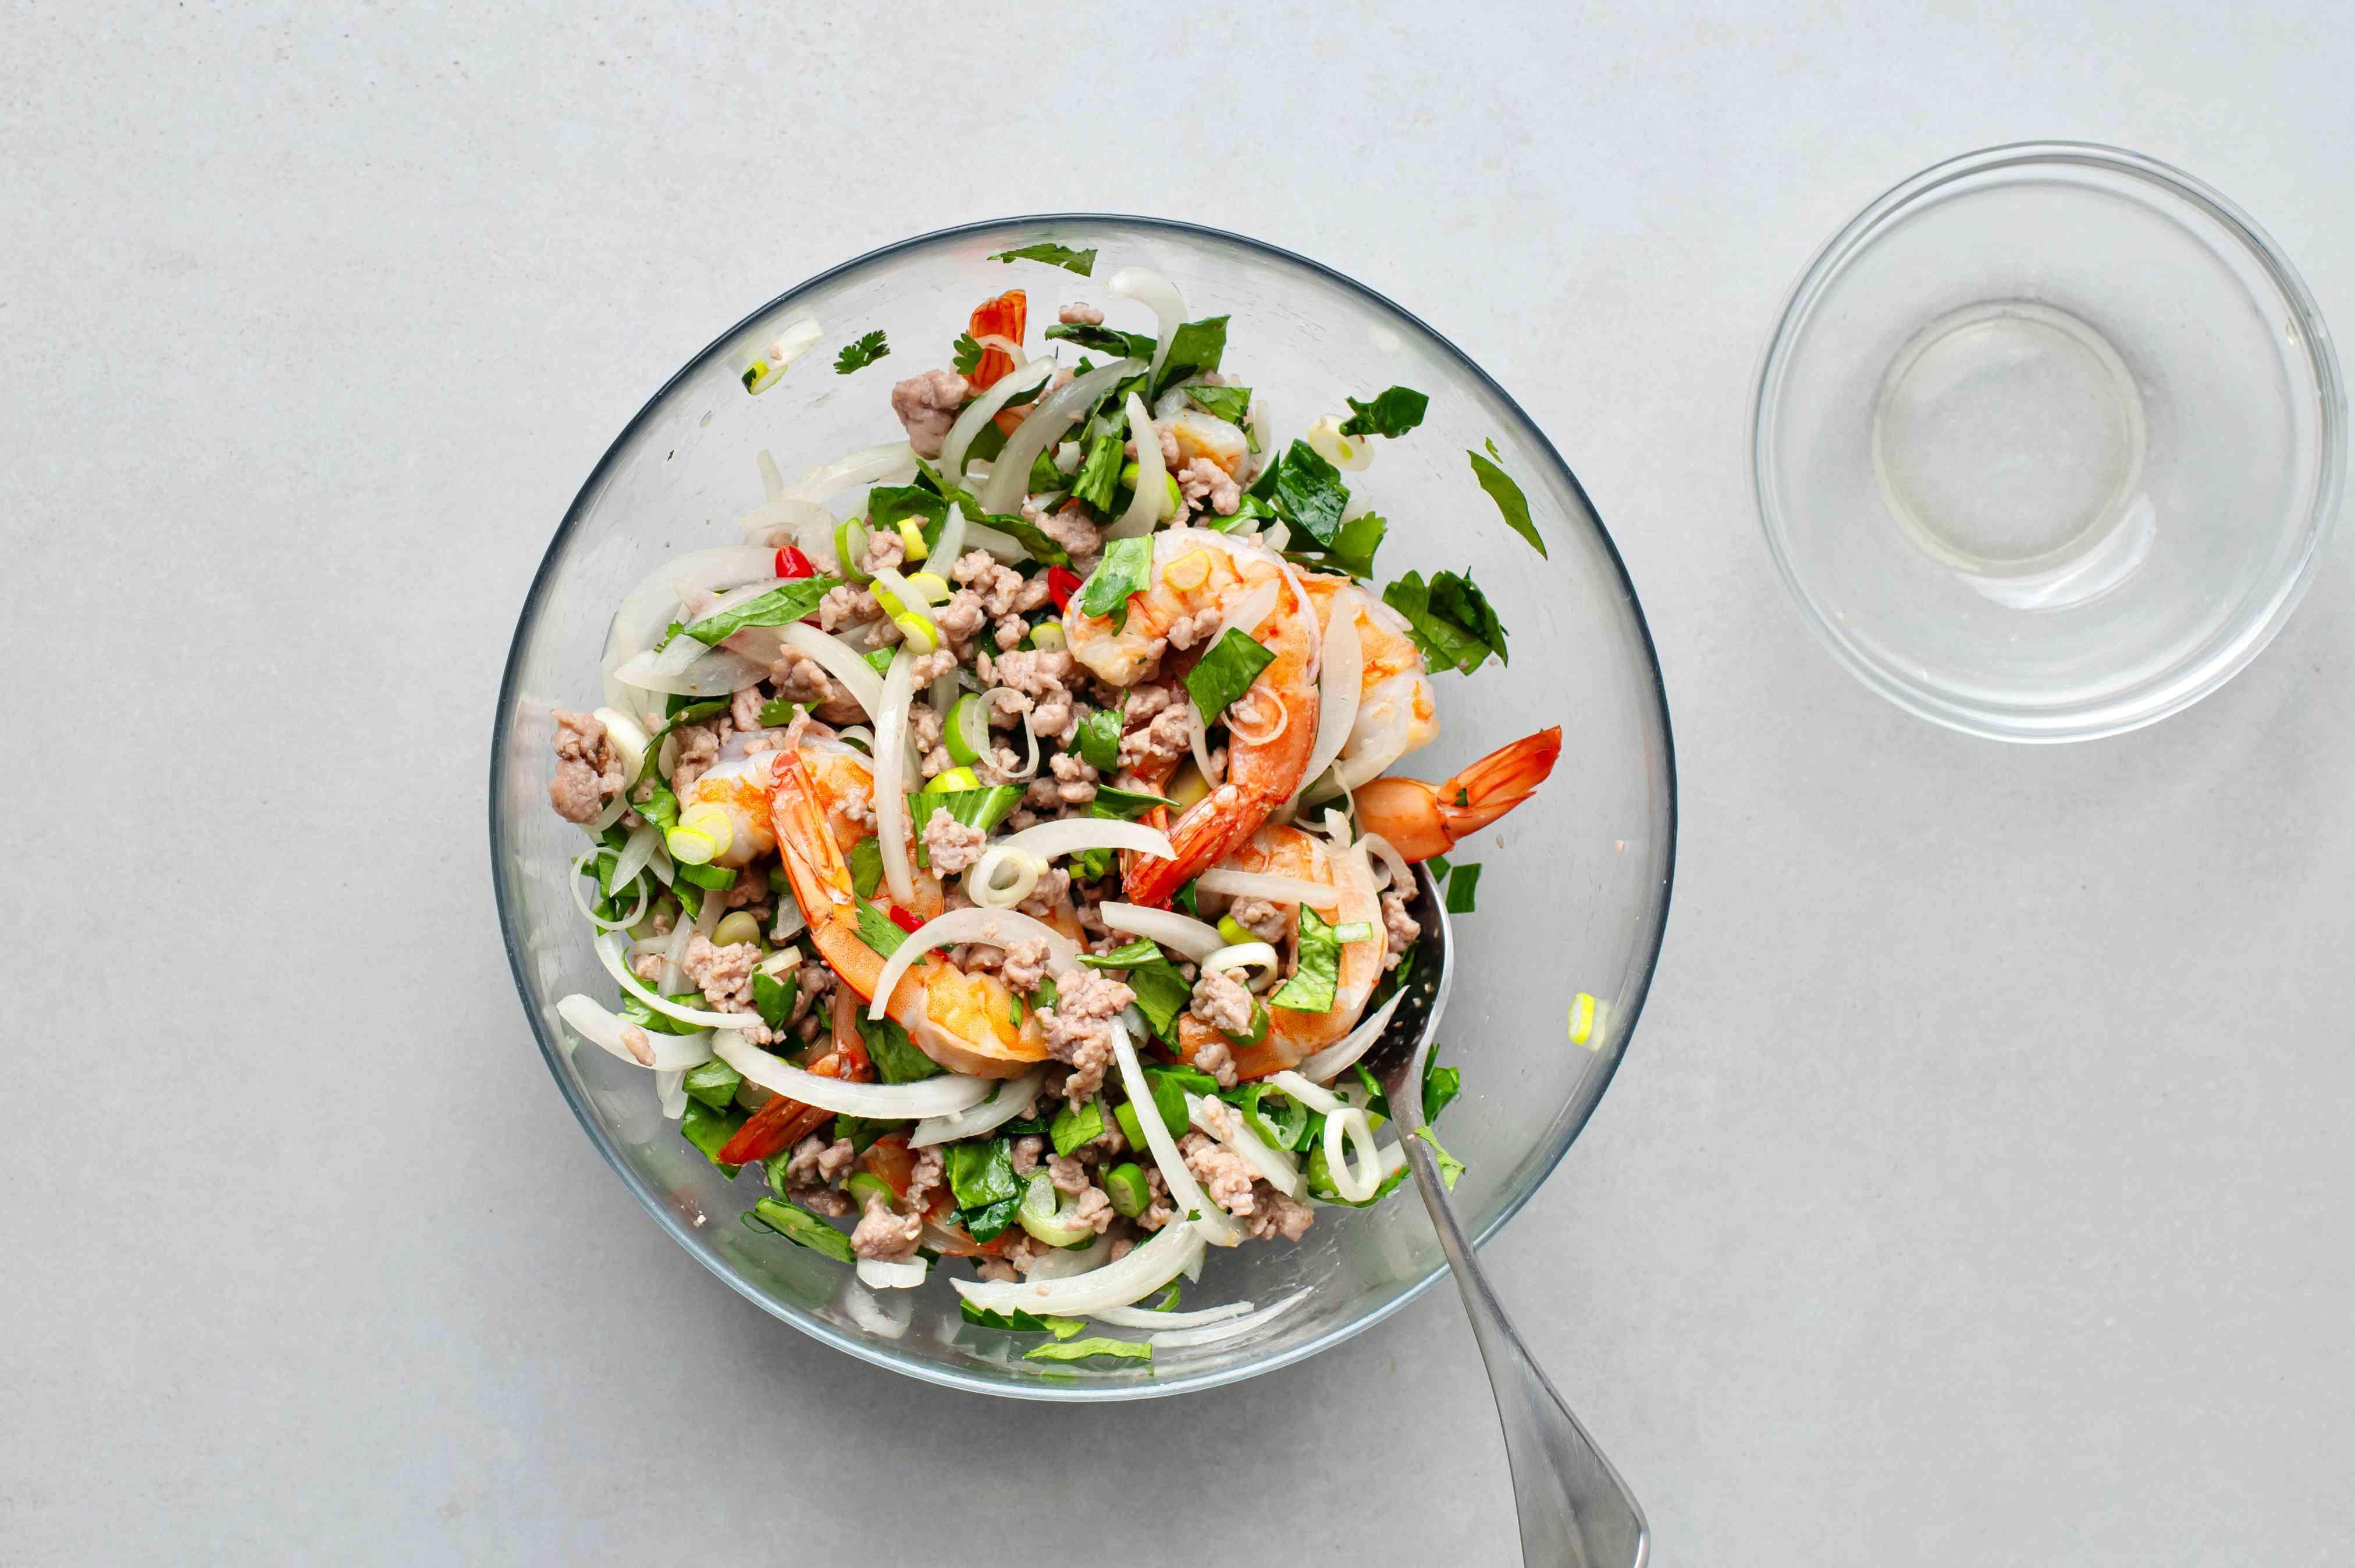 Thai Shrimp Salad (Shrimp Yum Goong) in a bowl